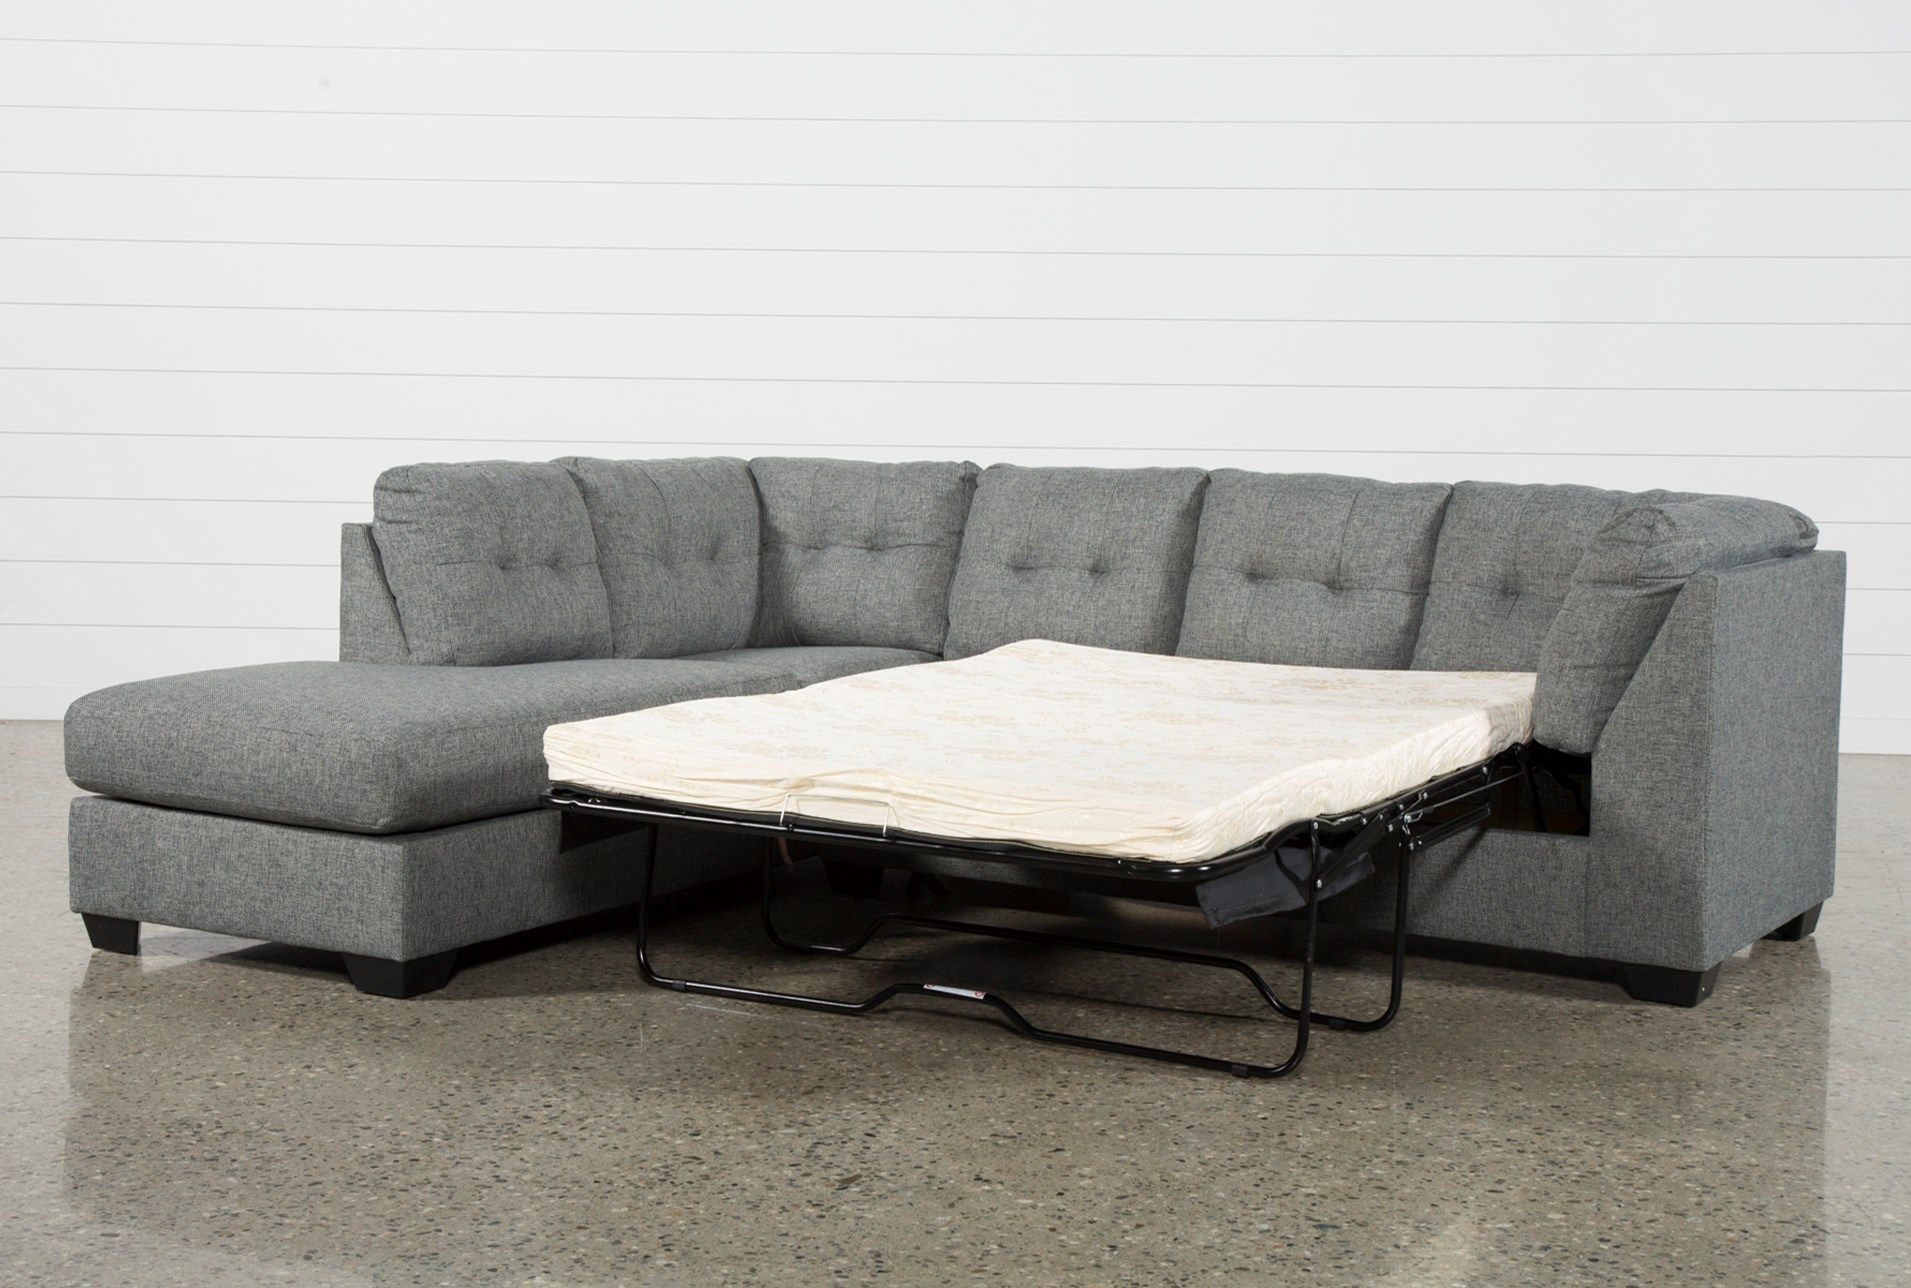 Wondrous Ashley Arrowmask 2 Piece Sectional Sofa With Sleeper Left Inzonedesignstudio Interior Chair Design Inzonedesignstudiocom